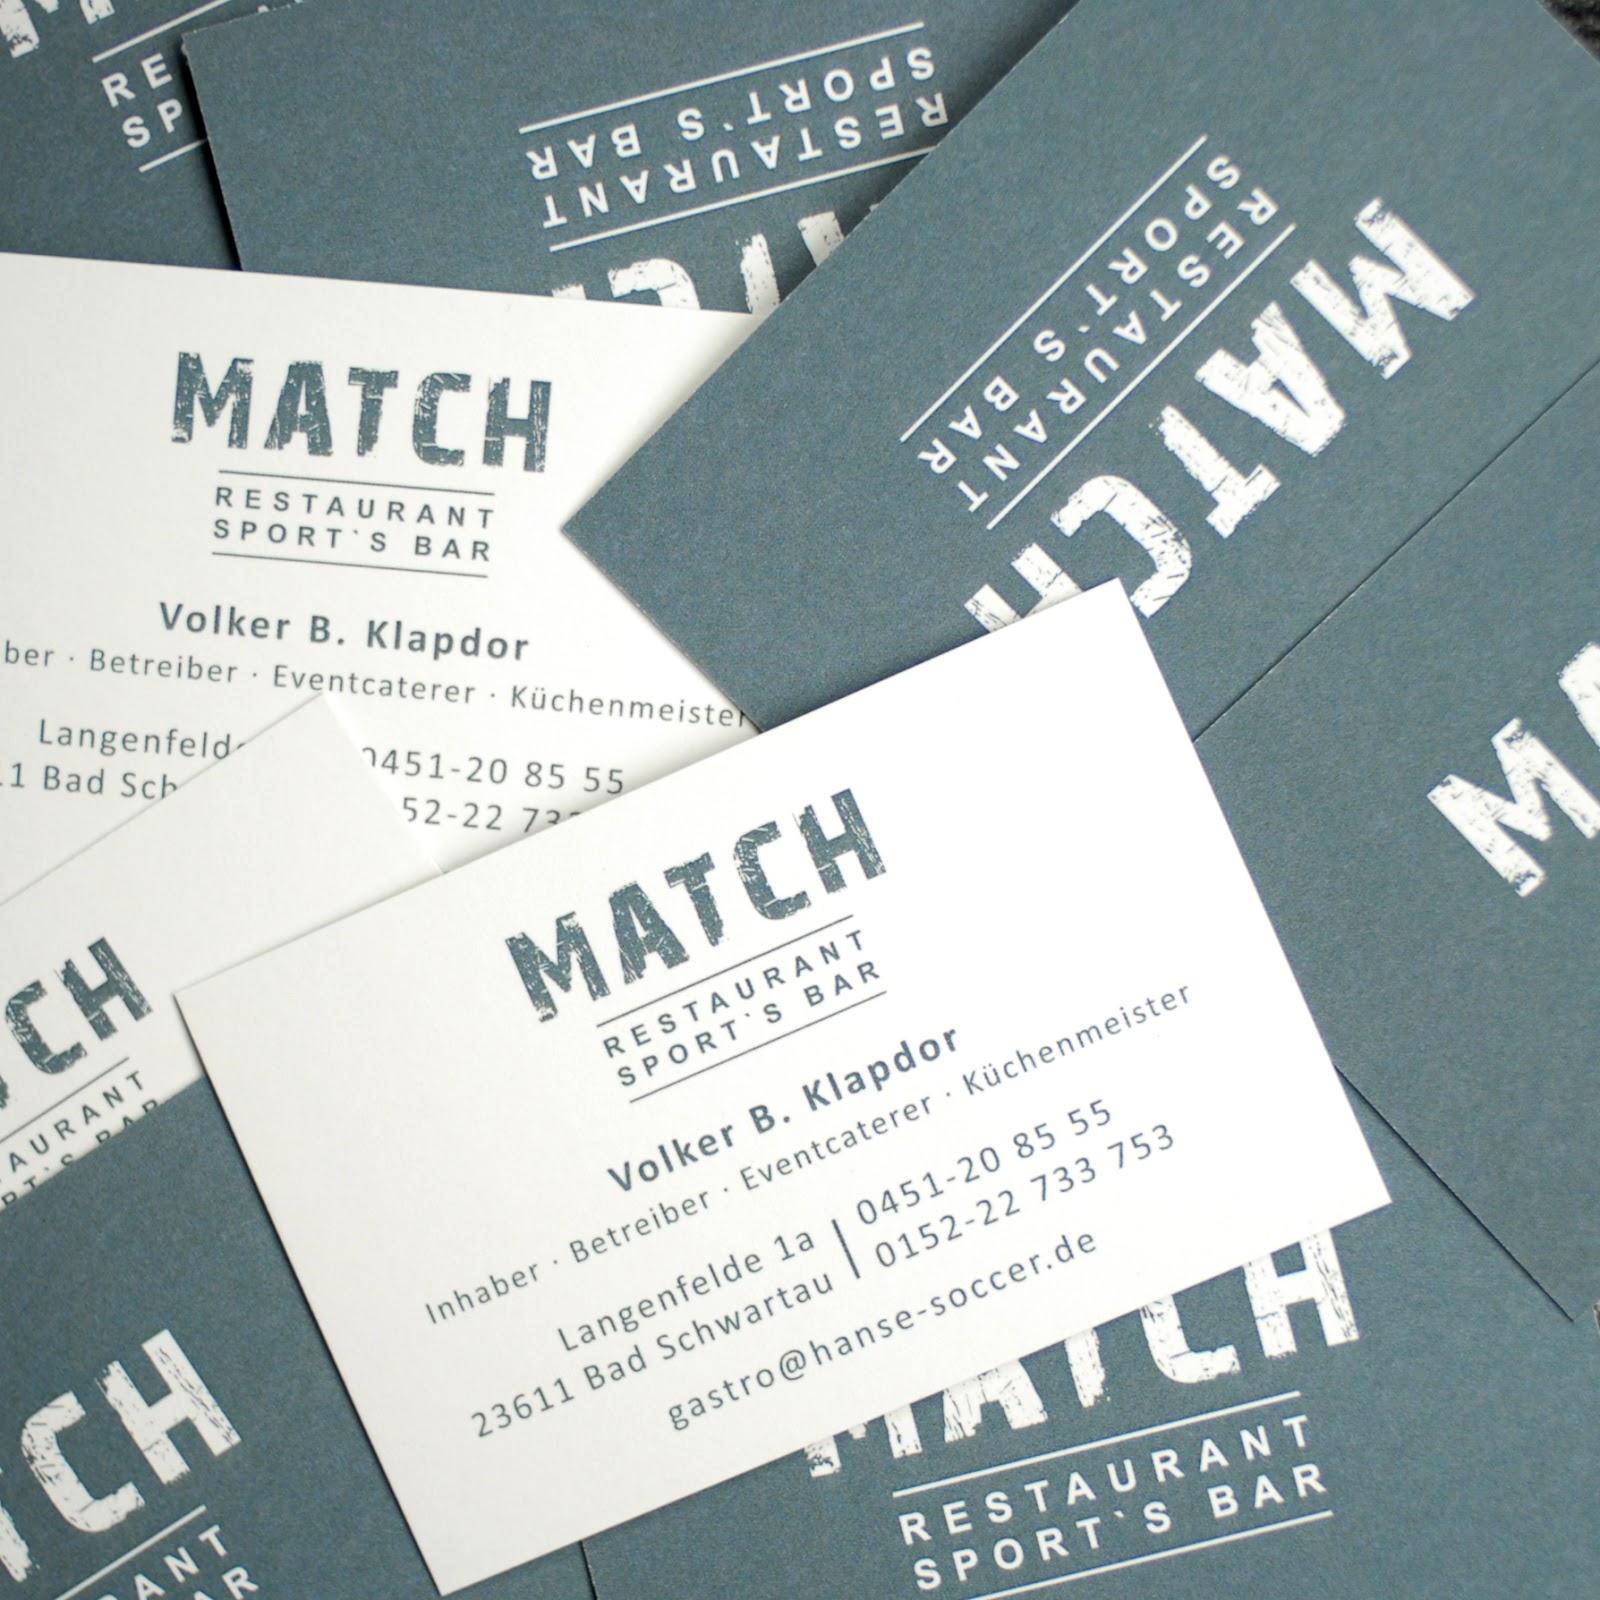 Logo Visitenkarten Für Restaurant Sport S Bar Match